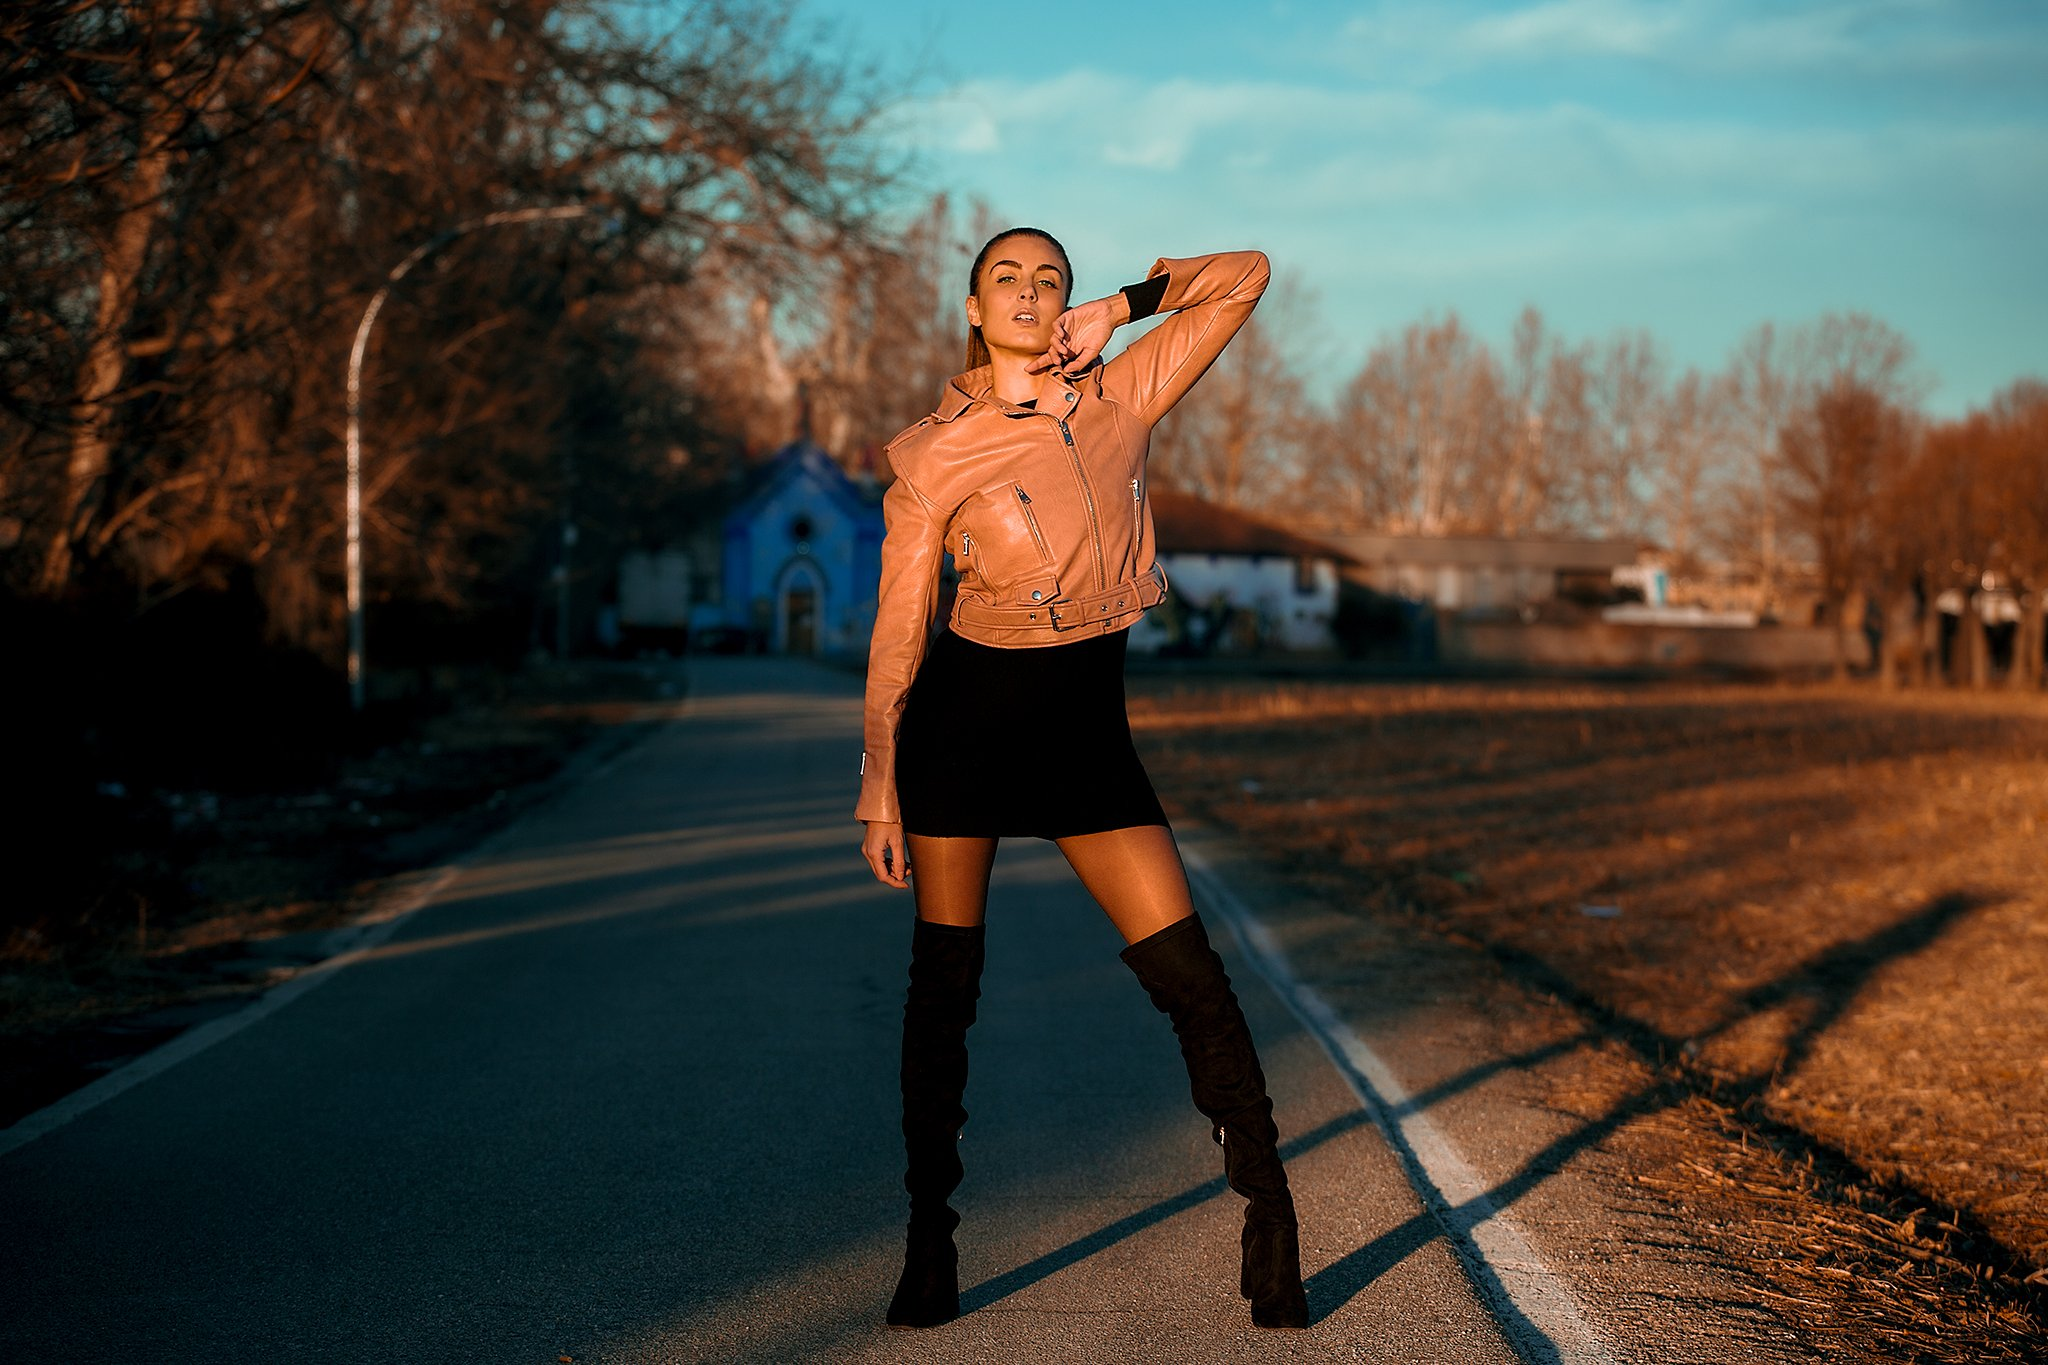 model,fashion,outdoor,winter,cold,legs,body,, roberto demaria